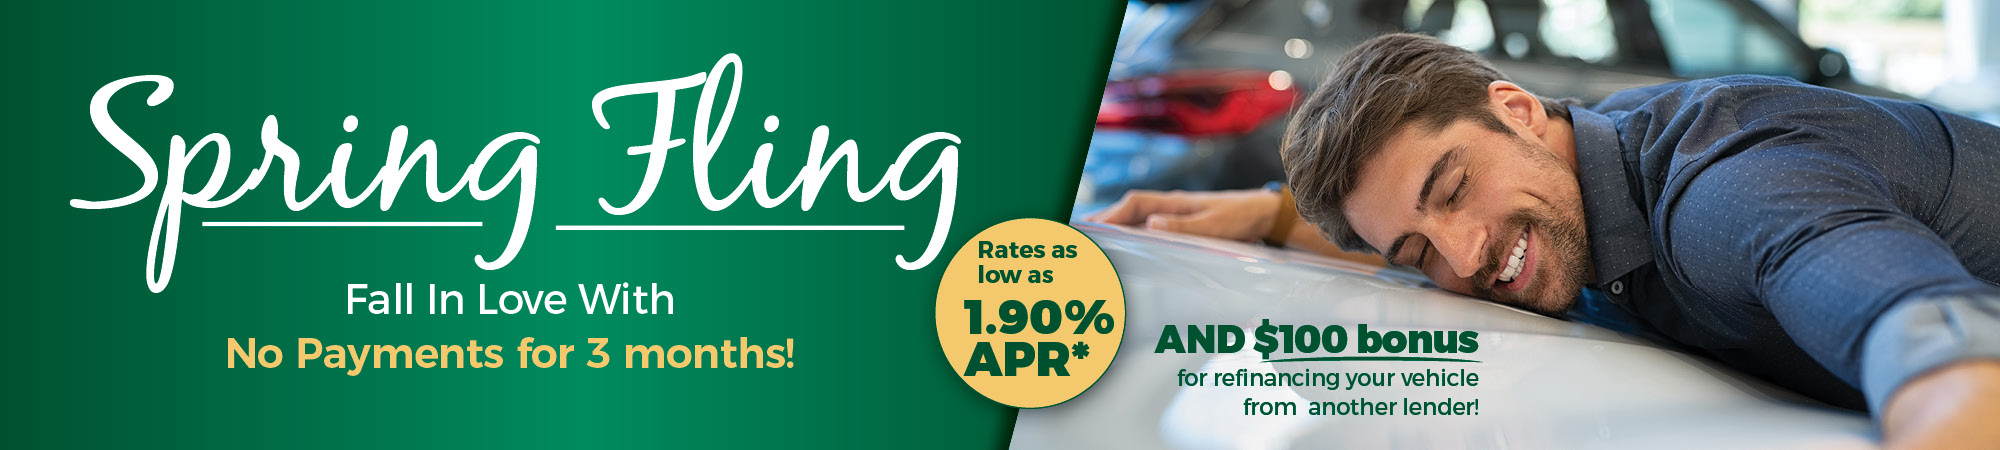 Spring Auto Loan